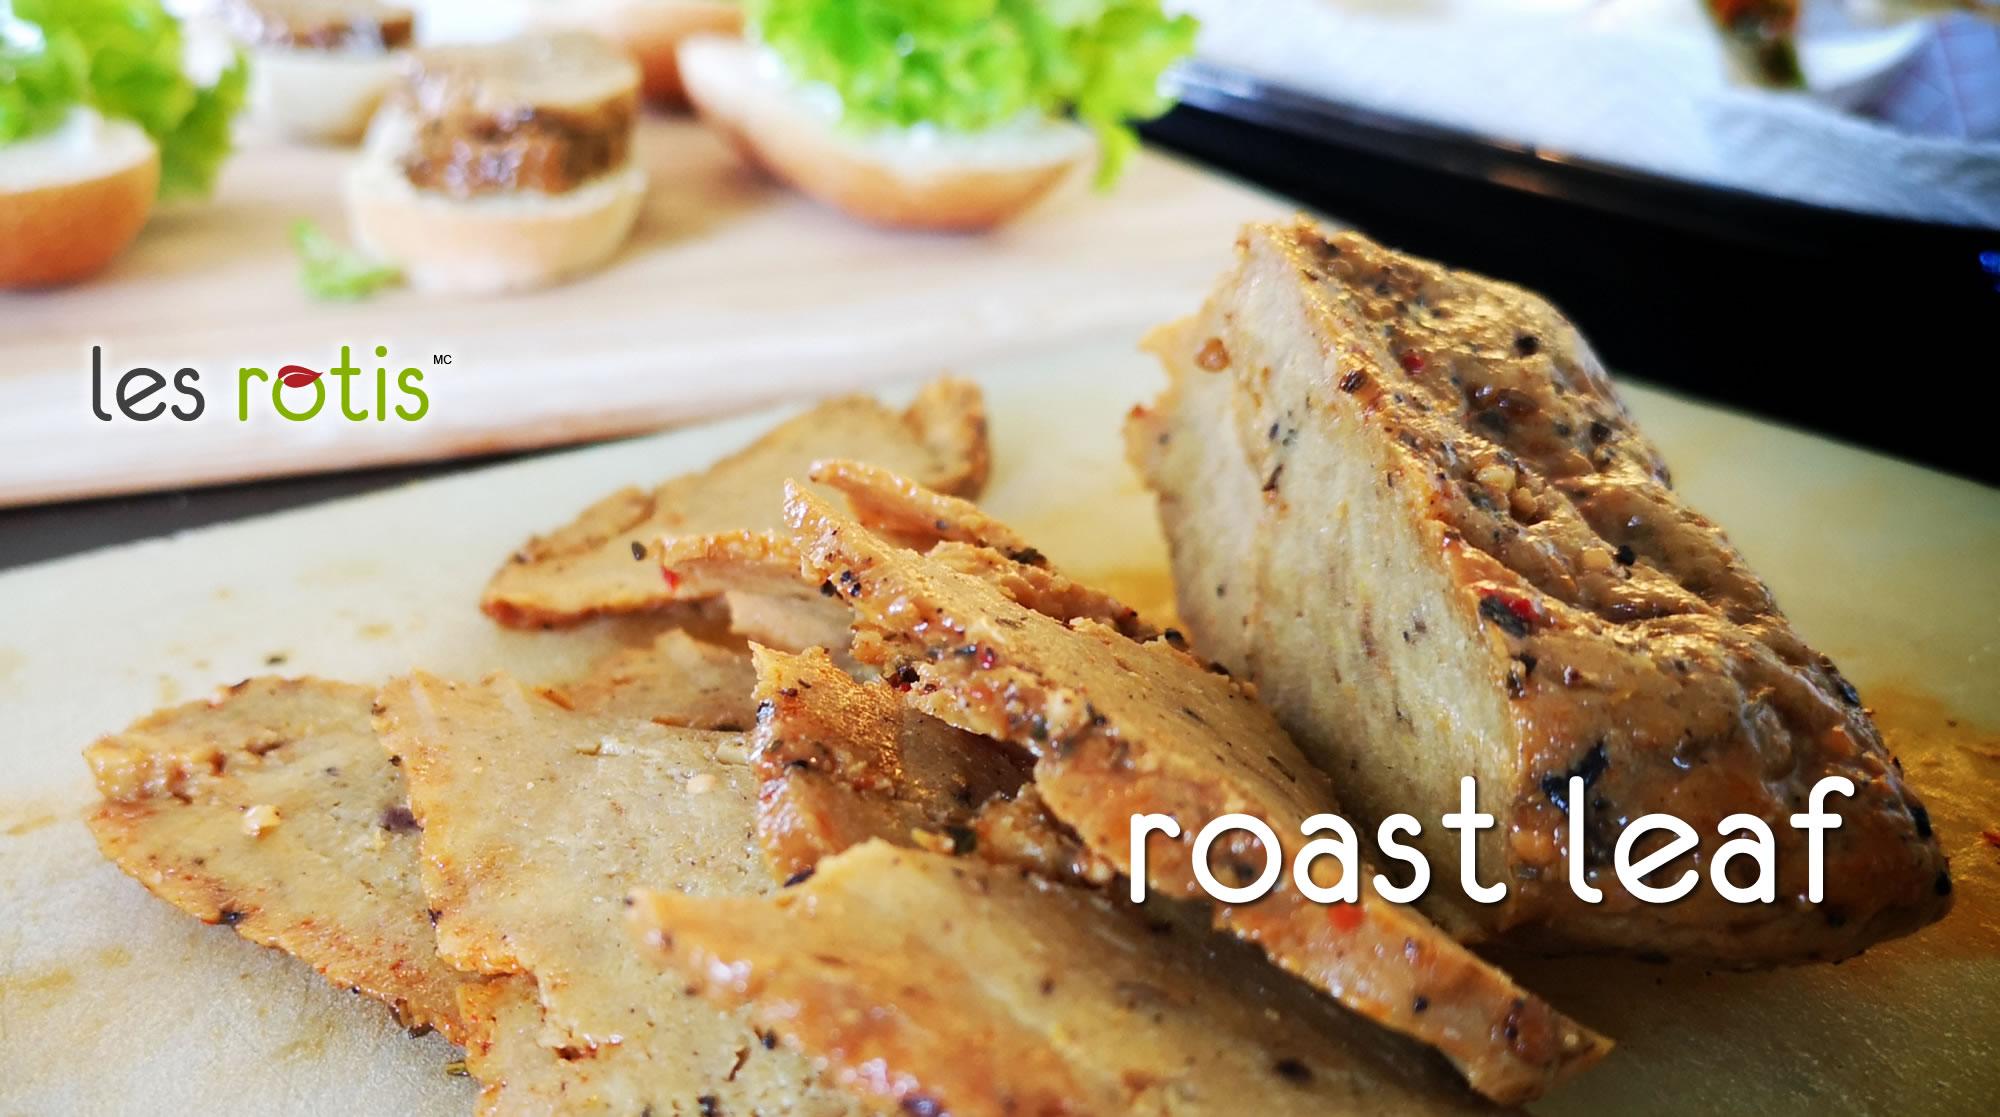 roast leaf - Contact